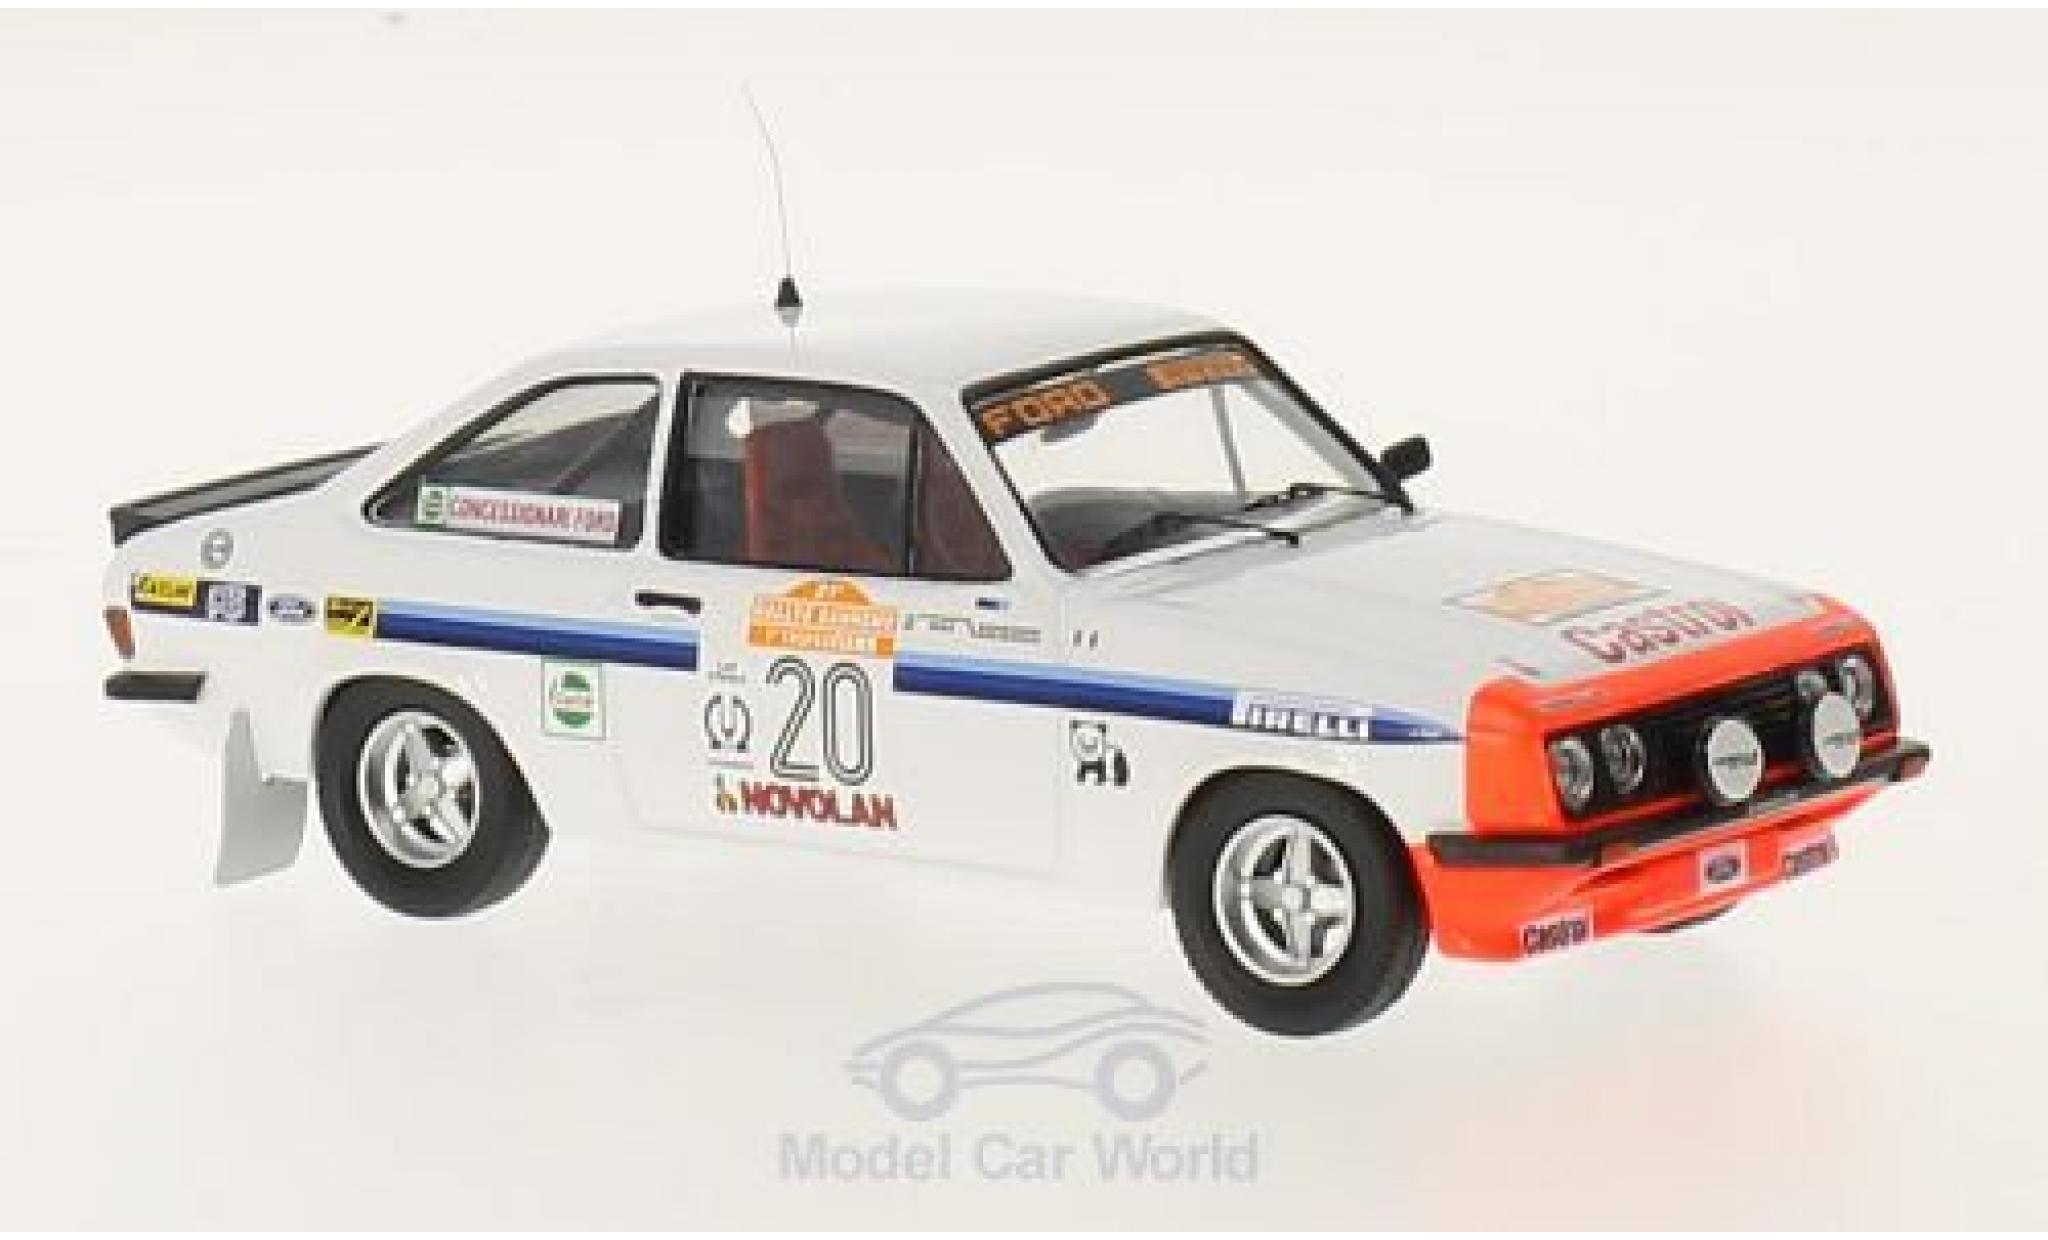 Ford Escort MKI 1/43 Trofeu I RS 2000 No.20 Rallye WM Rallye San Remo 1979 A.Presotto/M.Sghedoni